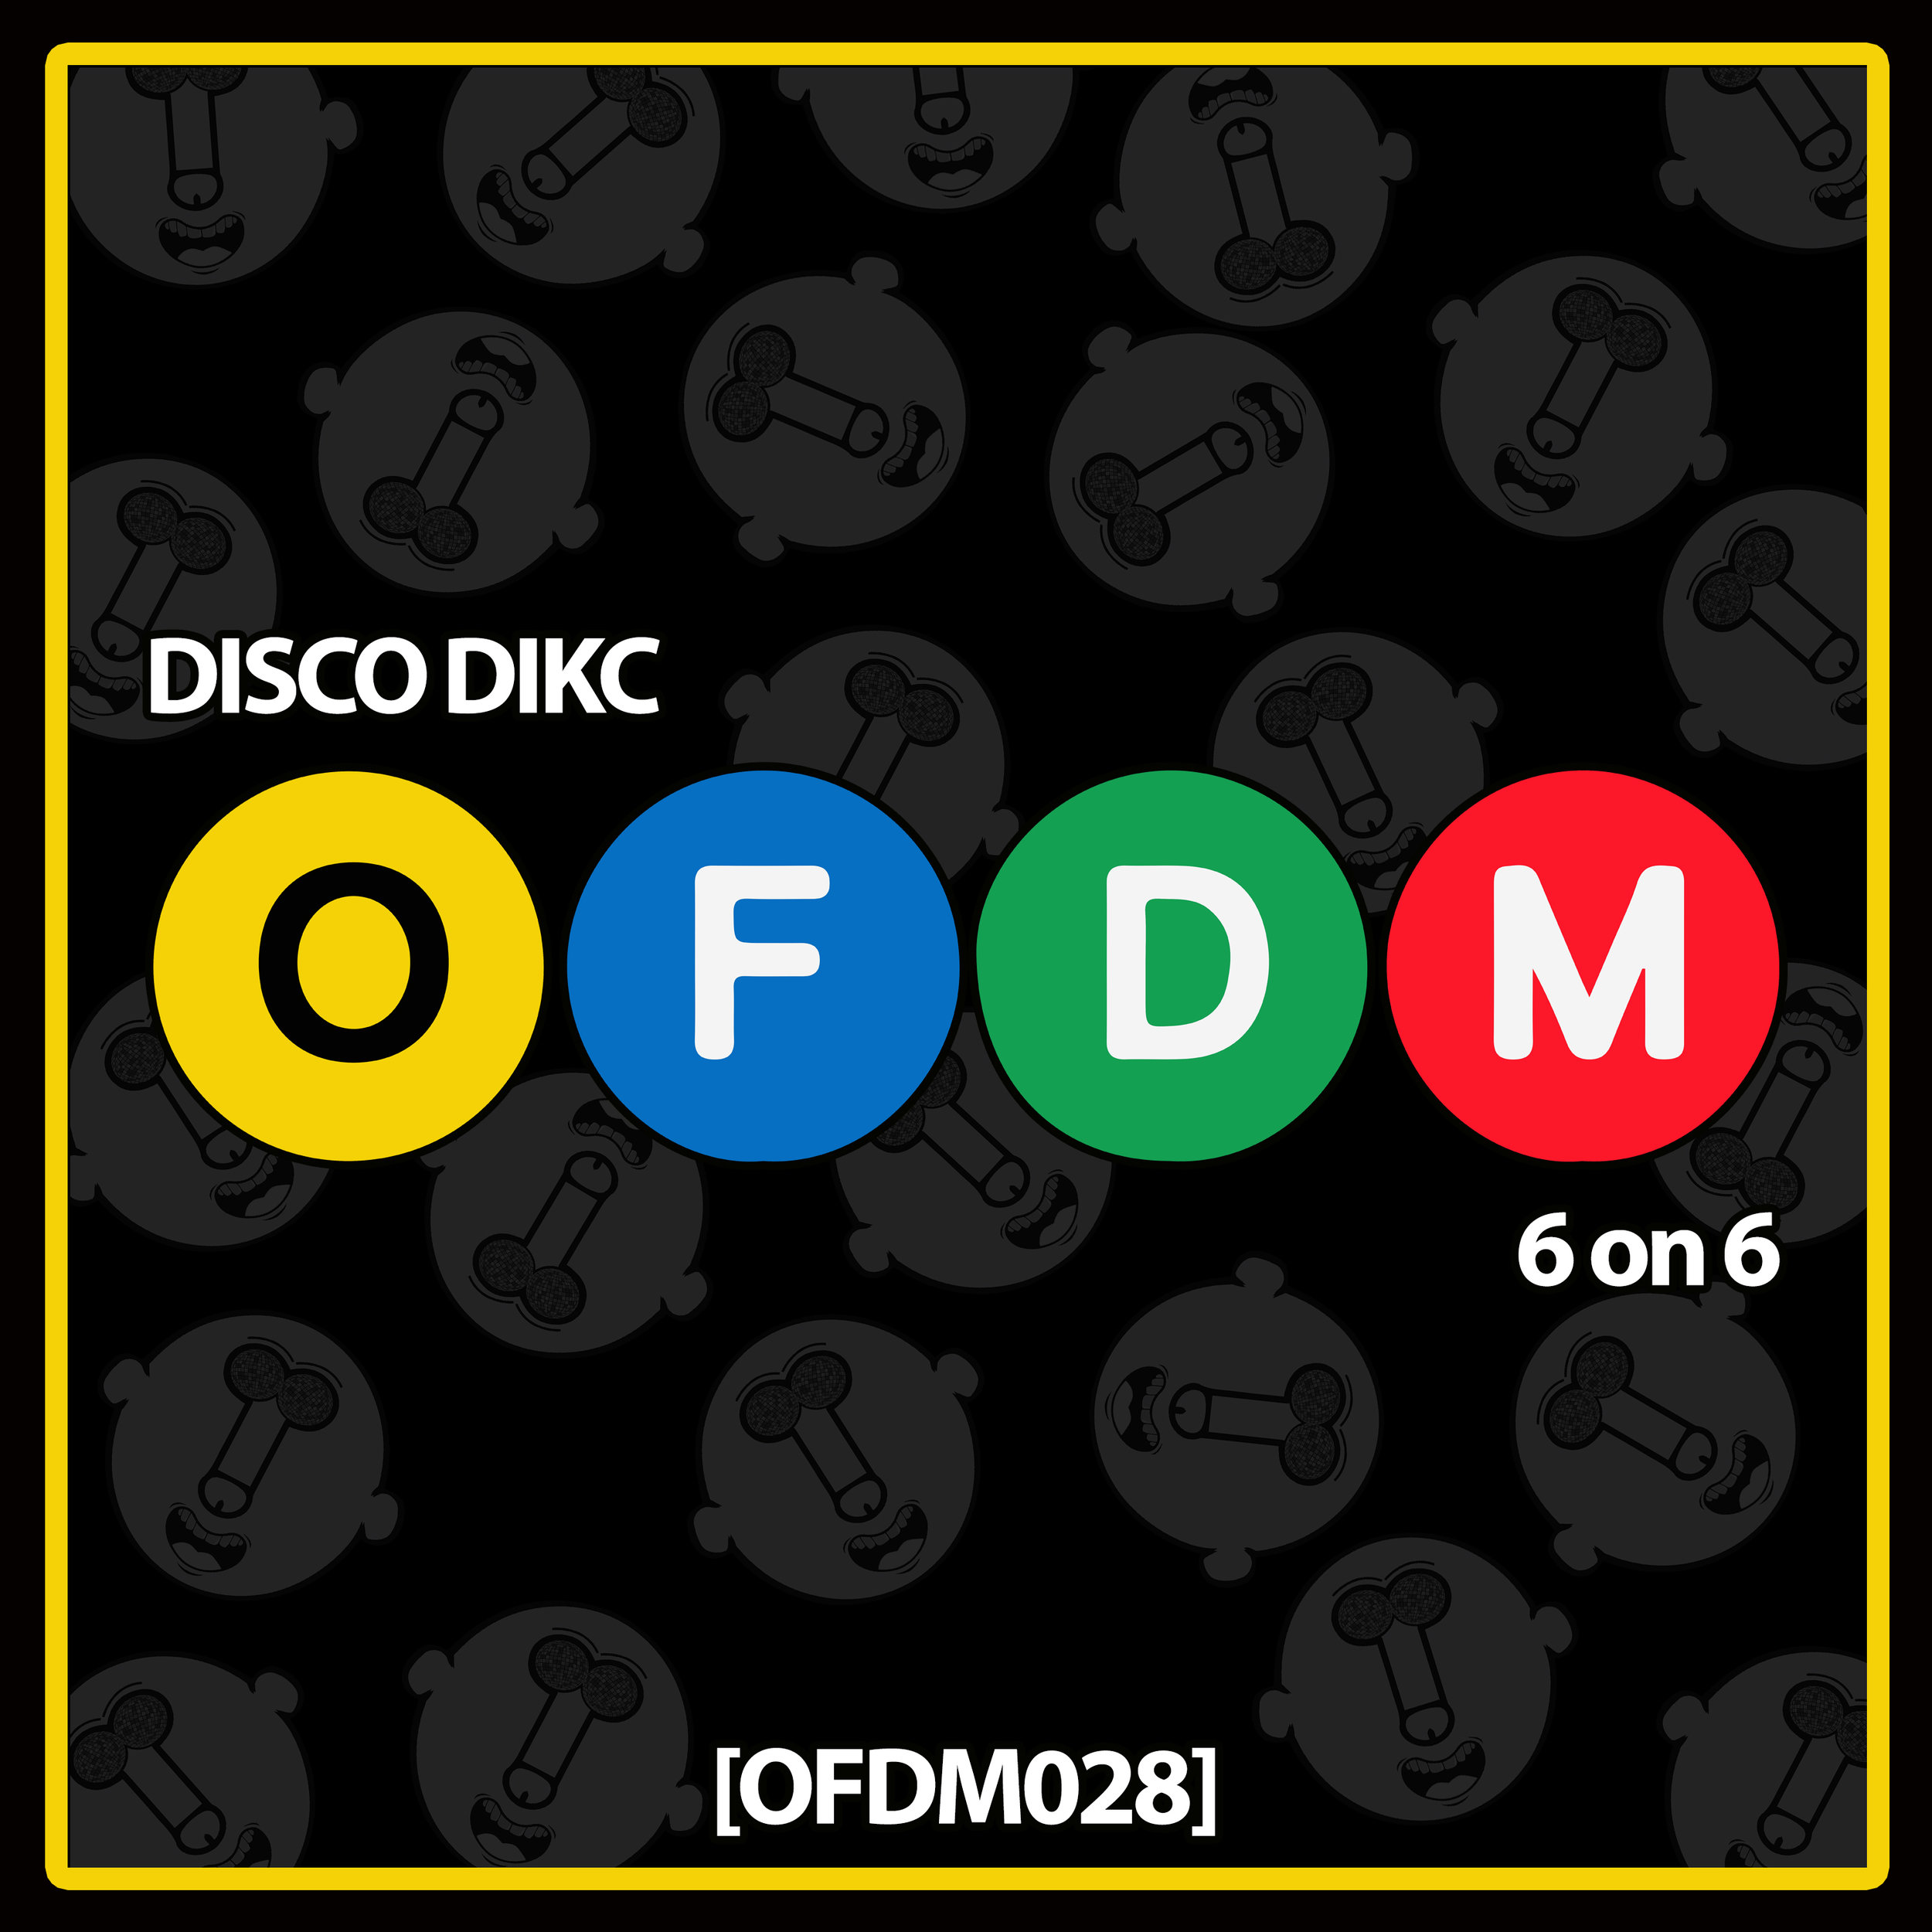 [OFDM028] - DISCO DIKC - 6 on 6.jpg